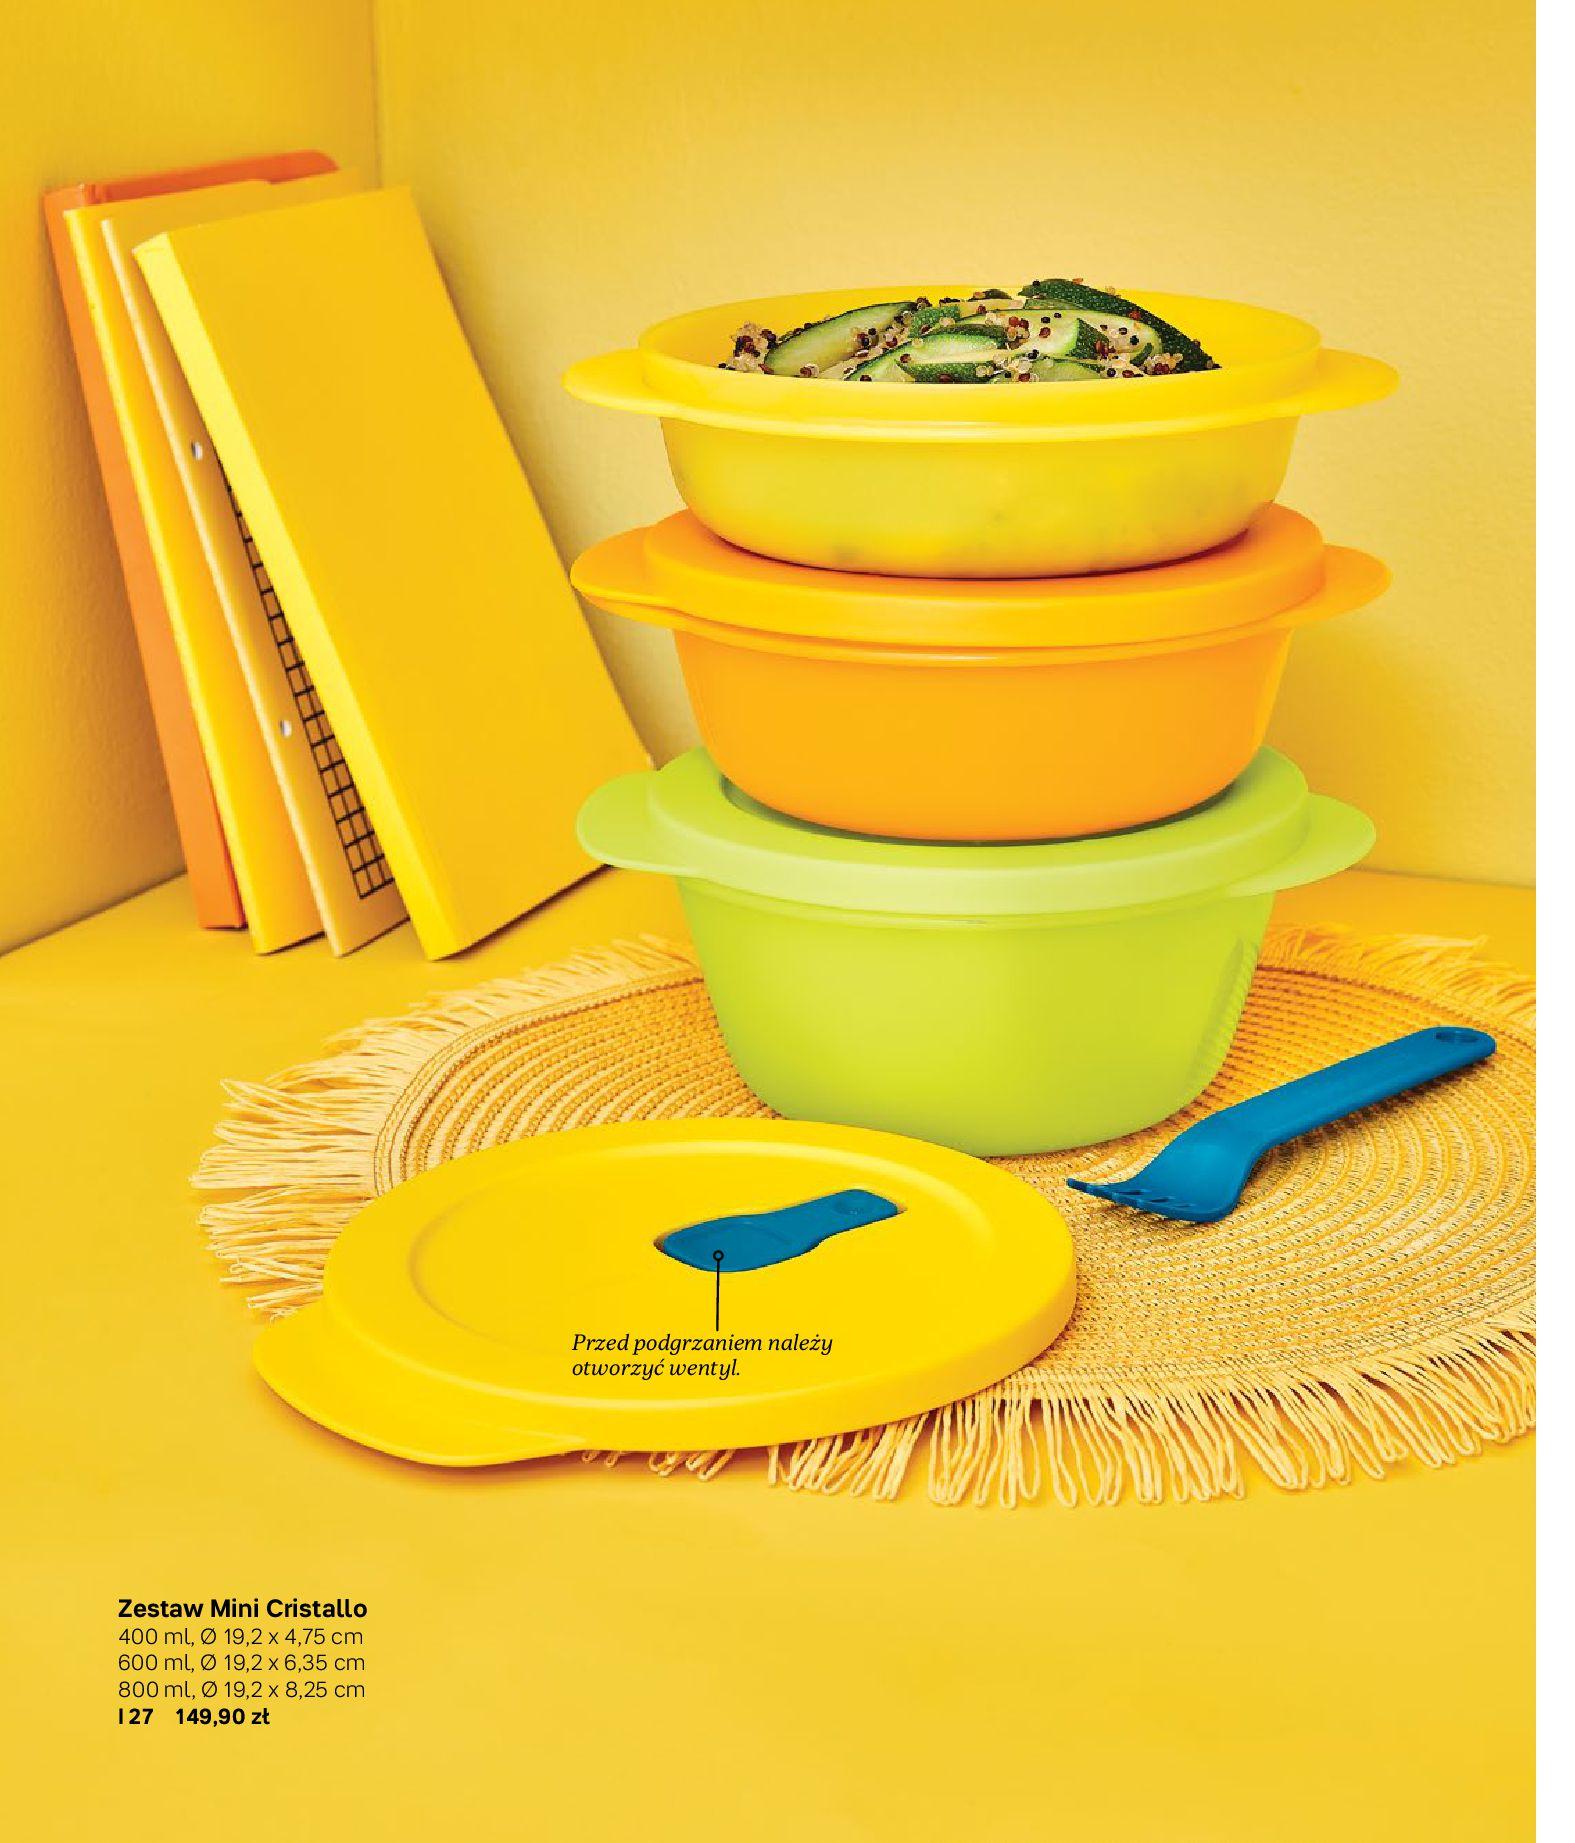 Gazetka Tupperware: Gazetka Tupperware - Katalog wiosna/ lato 2021-05-10 page-13